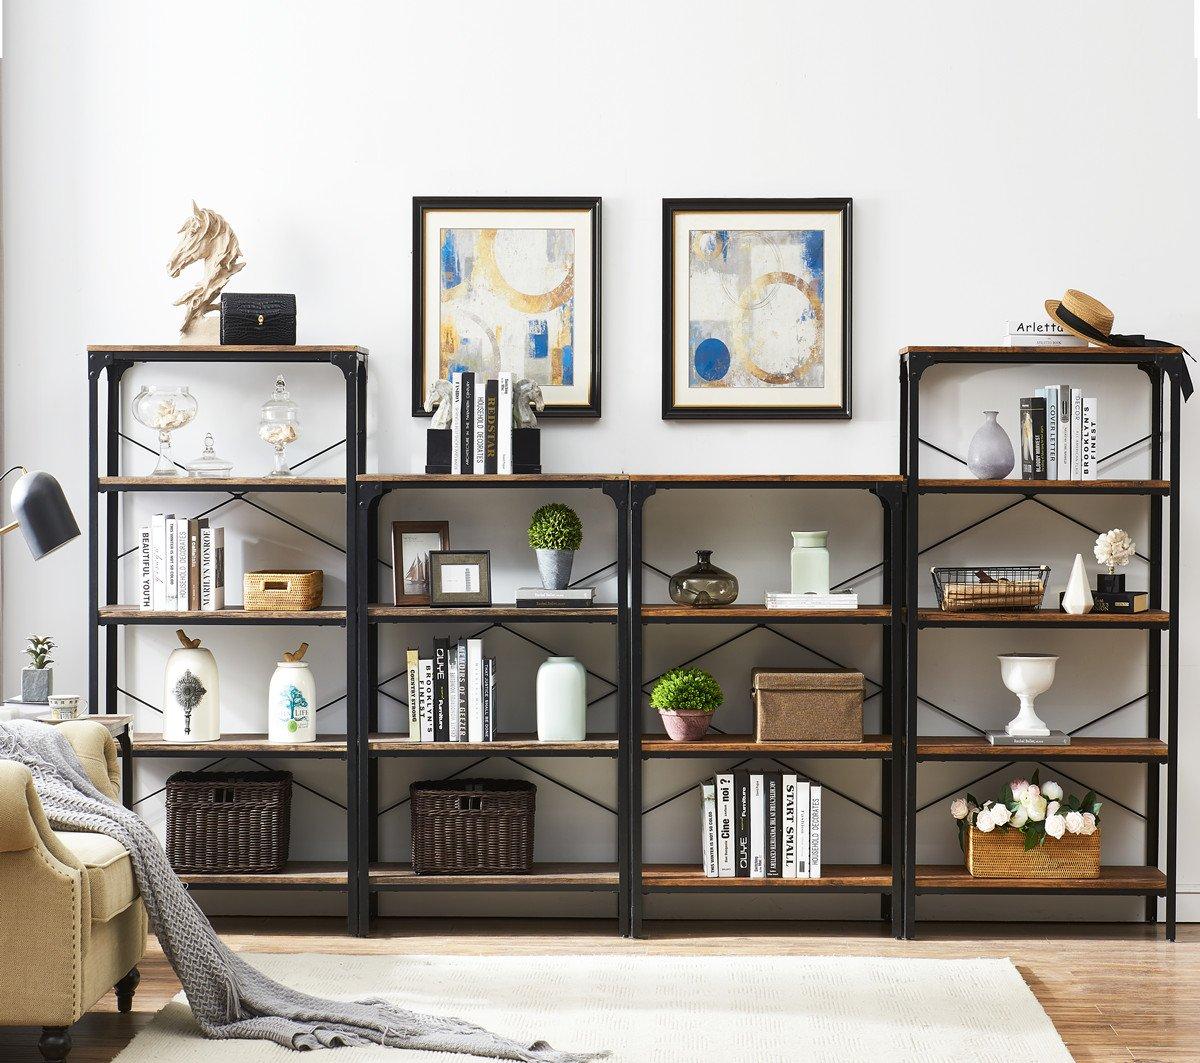 "O&K Furniture 4-Shelf Industrial Vintage Bookcase, Metal Bookshelf, 48""H x 33""W x 13""D, Barn-Wood Finish by O&K Furniture (Image #8)"